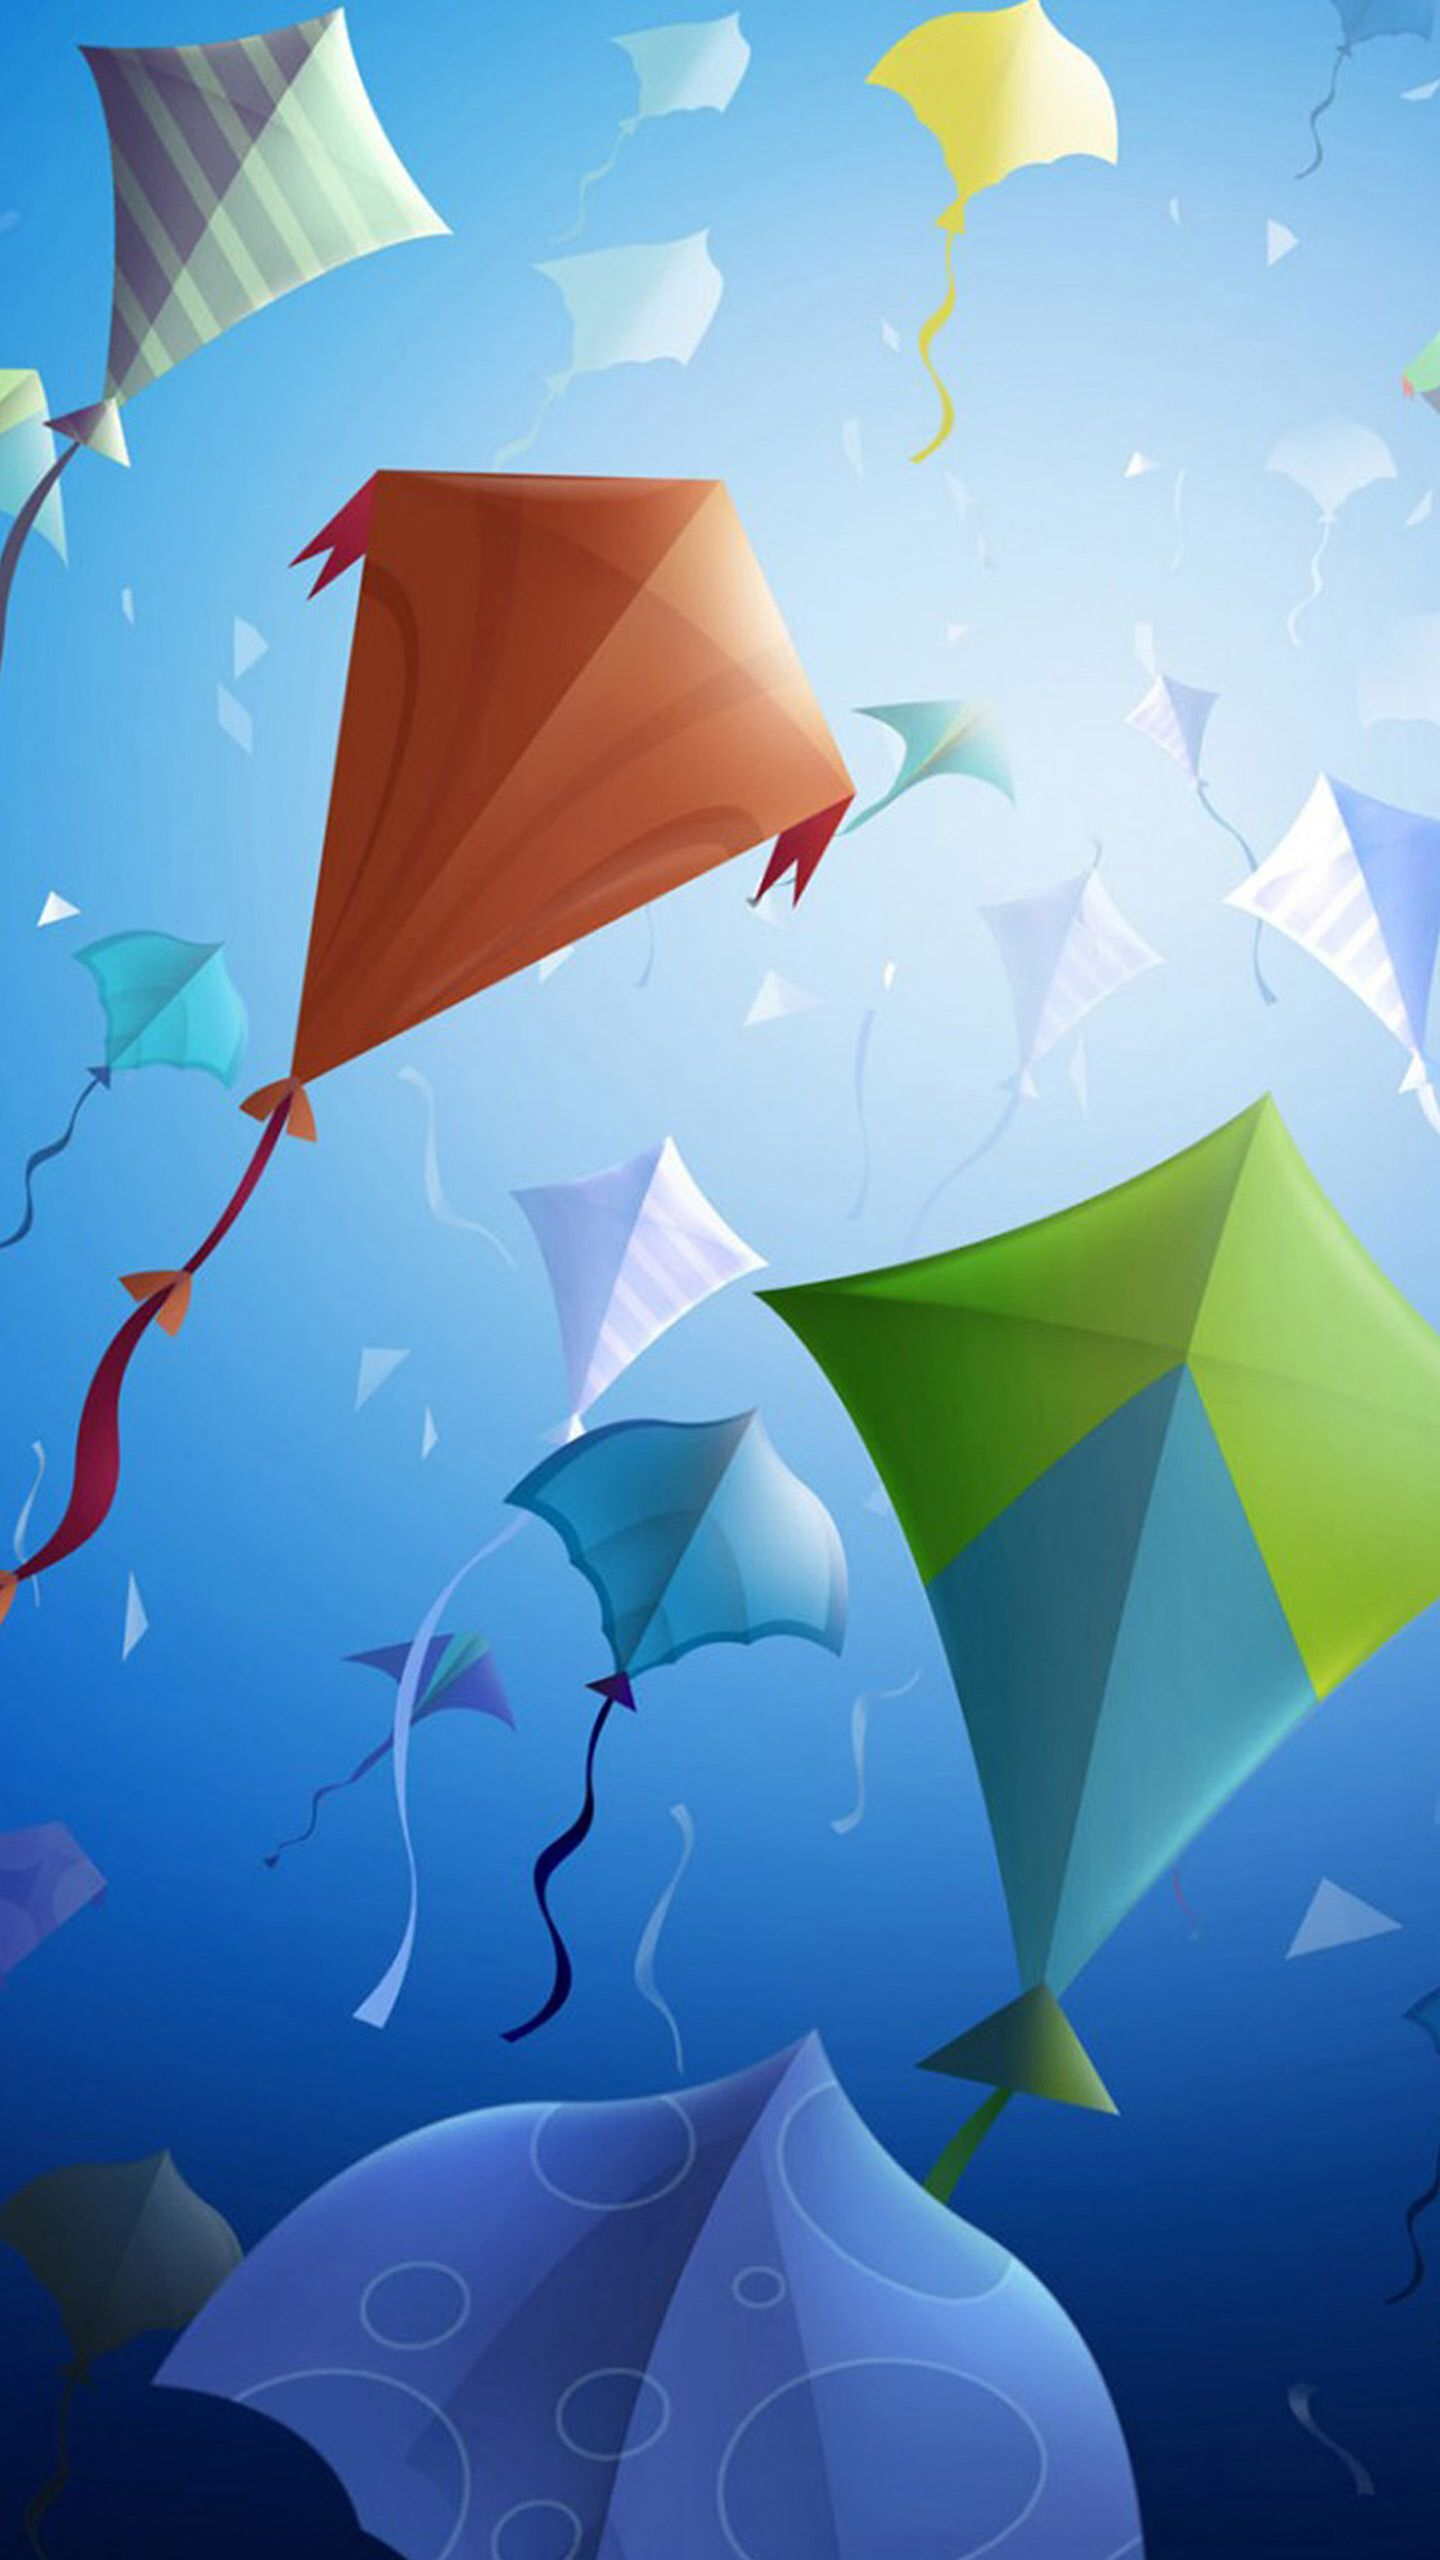 Blue, green, kites, light, abstract, apple, wallpaper